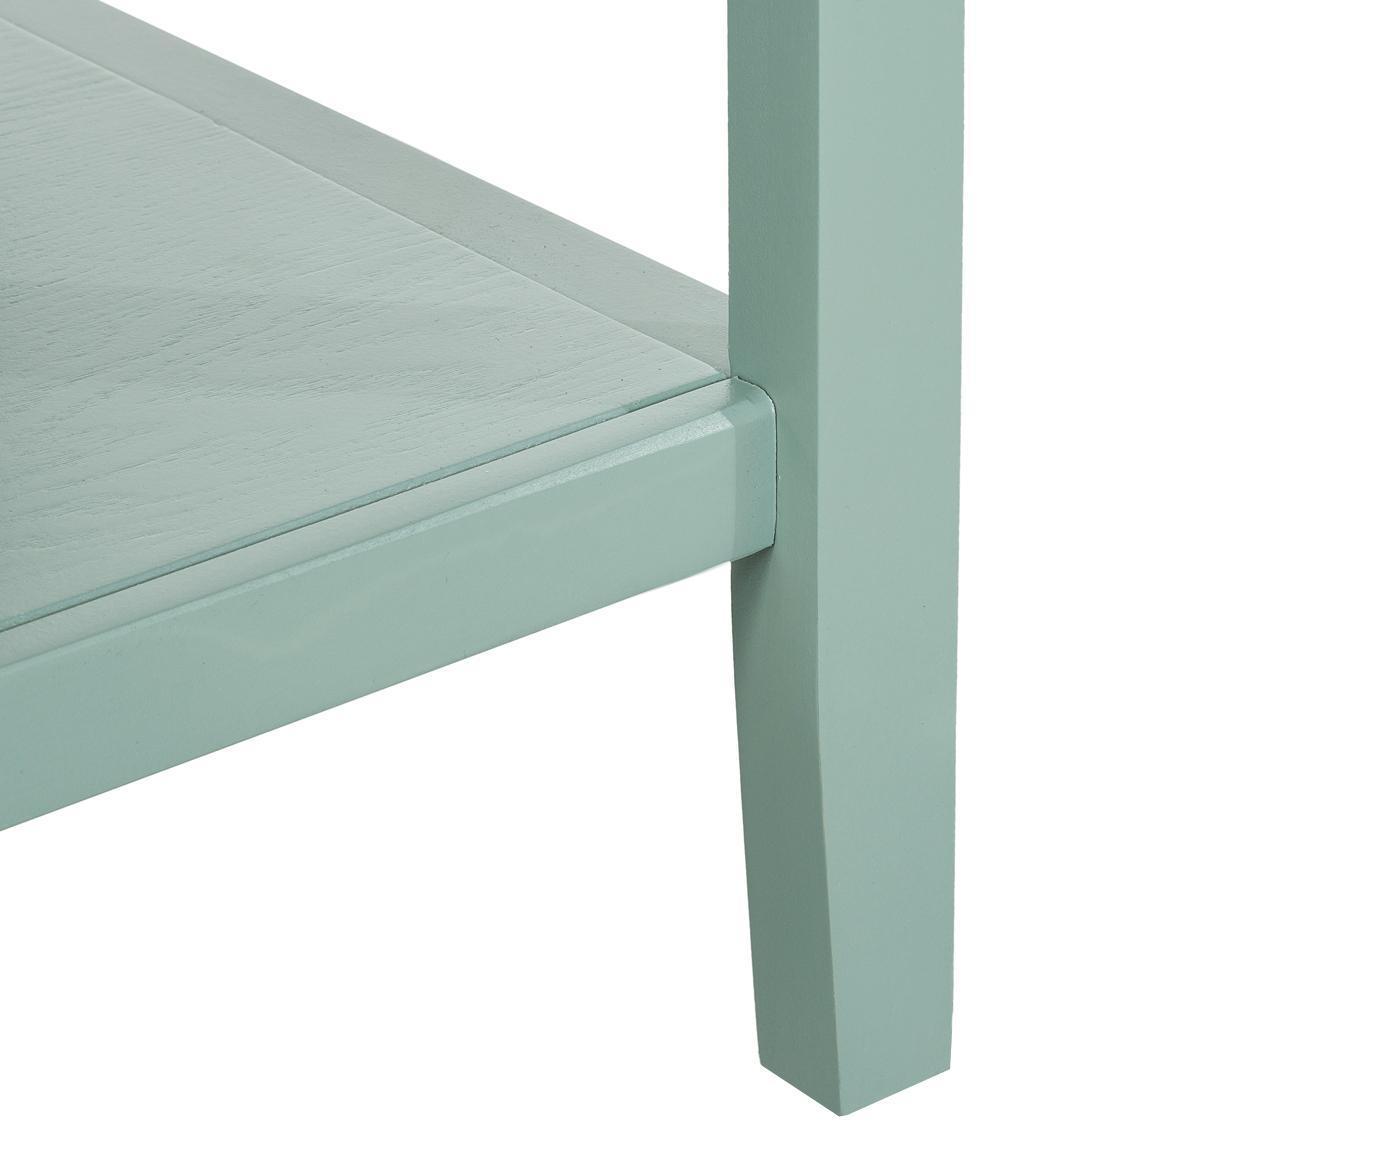 Sideboard Amy im Landhausstil, Korpus: Ulmenholz, Kiefernholz, l, Griffe: Zinklegierung, Mintgrün, 116 x 86 cm